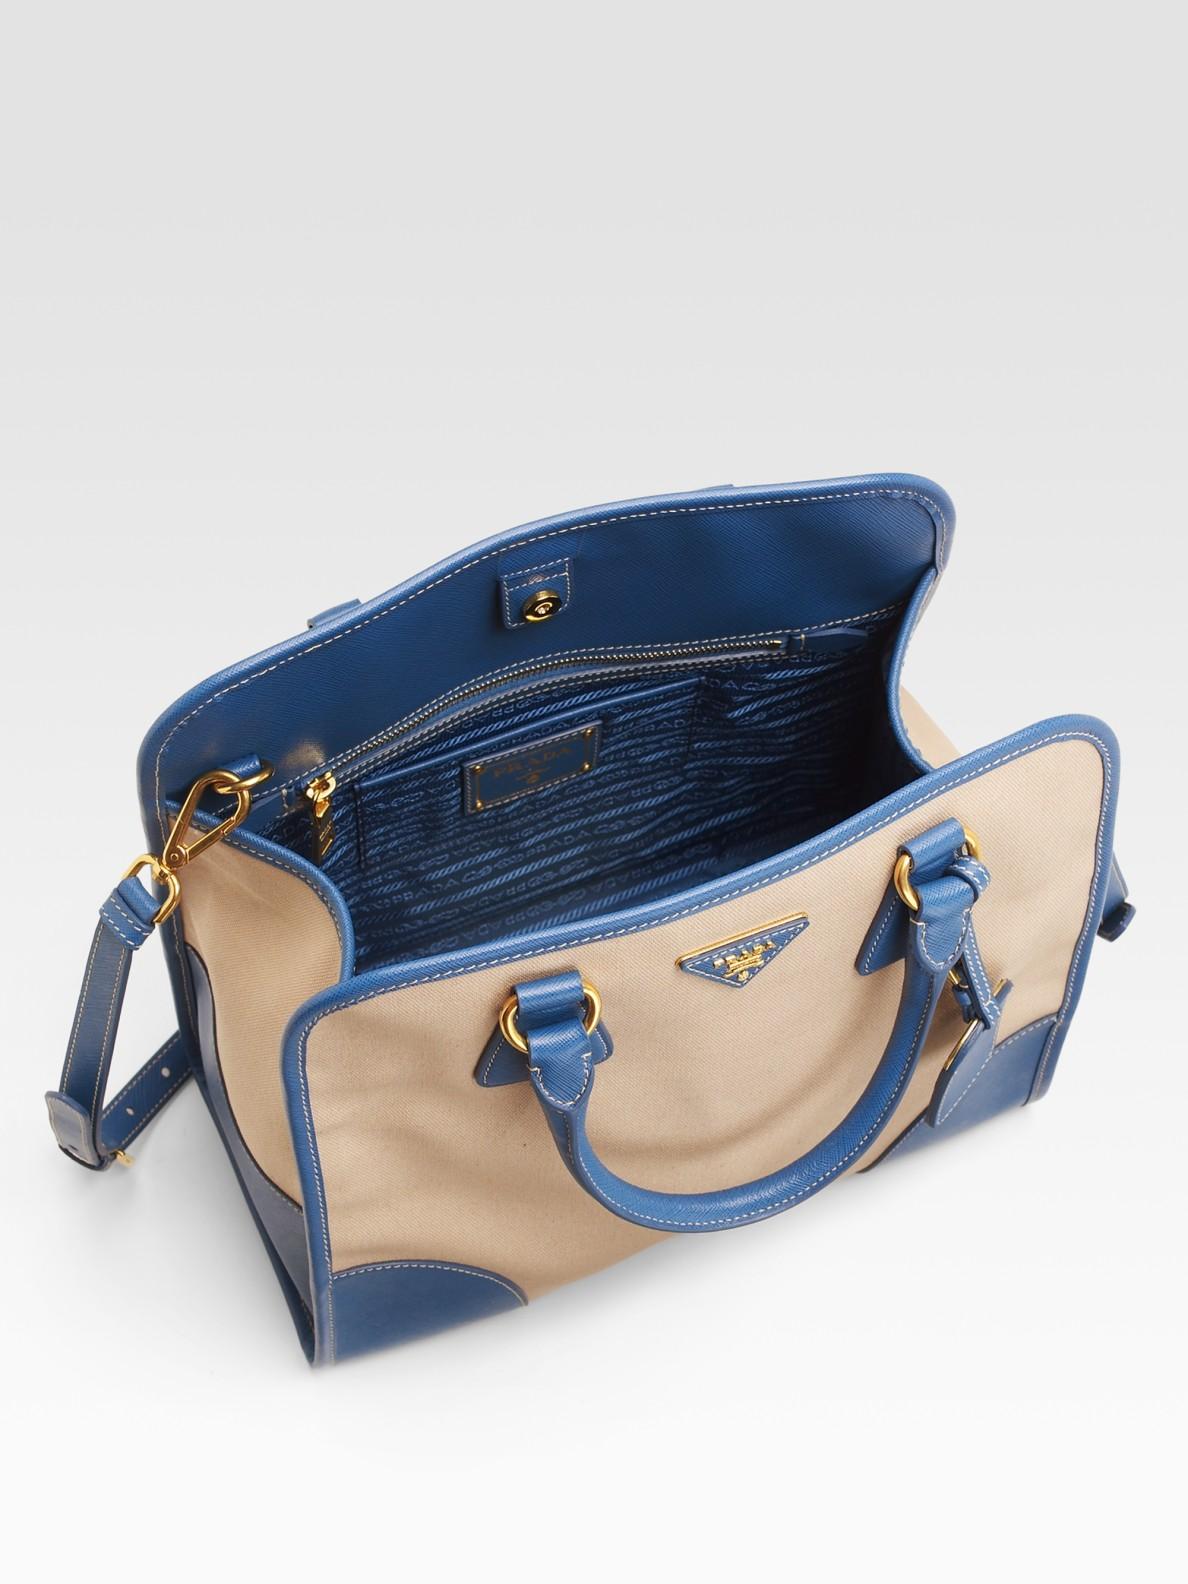 Prada Canvas \u0026amp; Saffiano Framed North-to-south Tote Bag in Blue ...